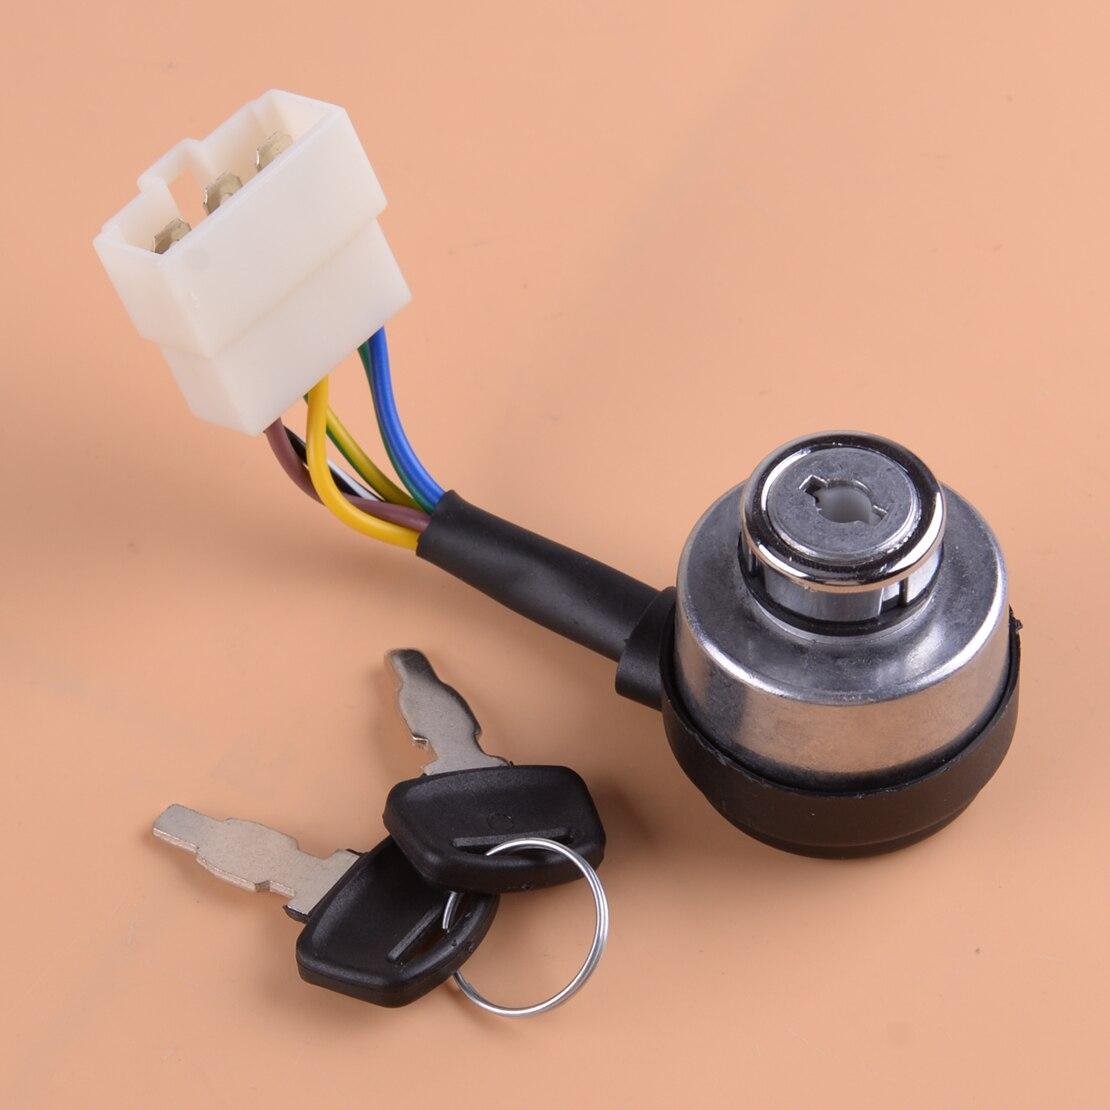 Ignition Key Switch For Honda EU3000iS EU3000iS1 6.5HP 2.8KW 3KW Generator